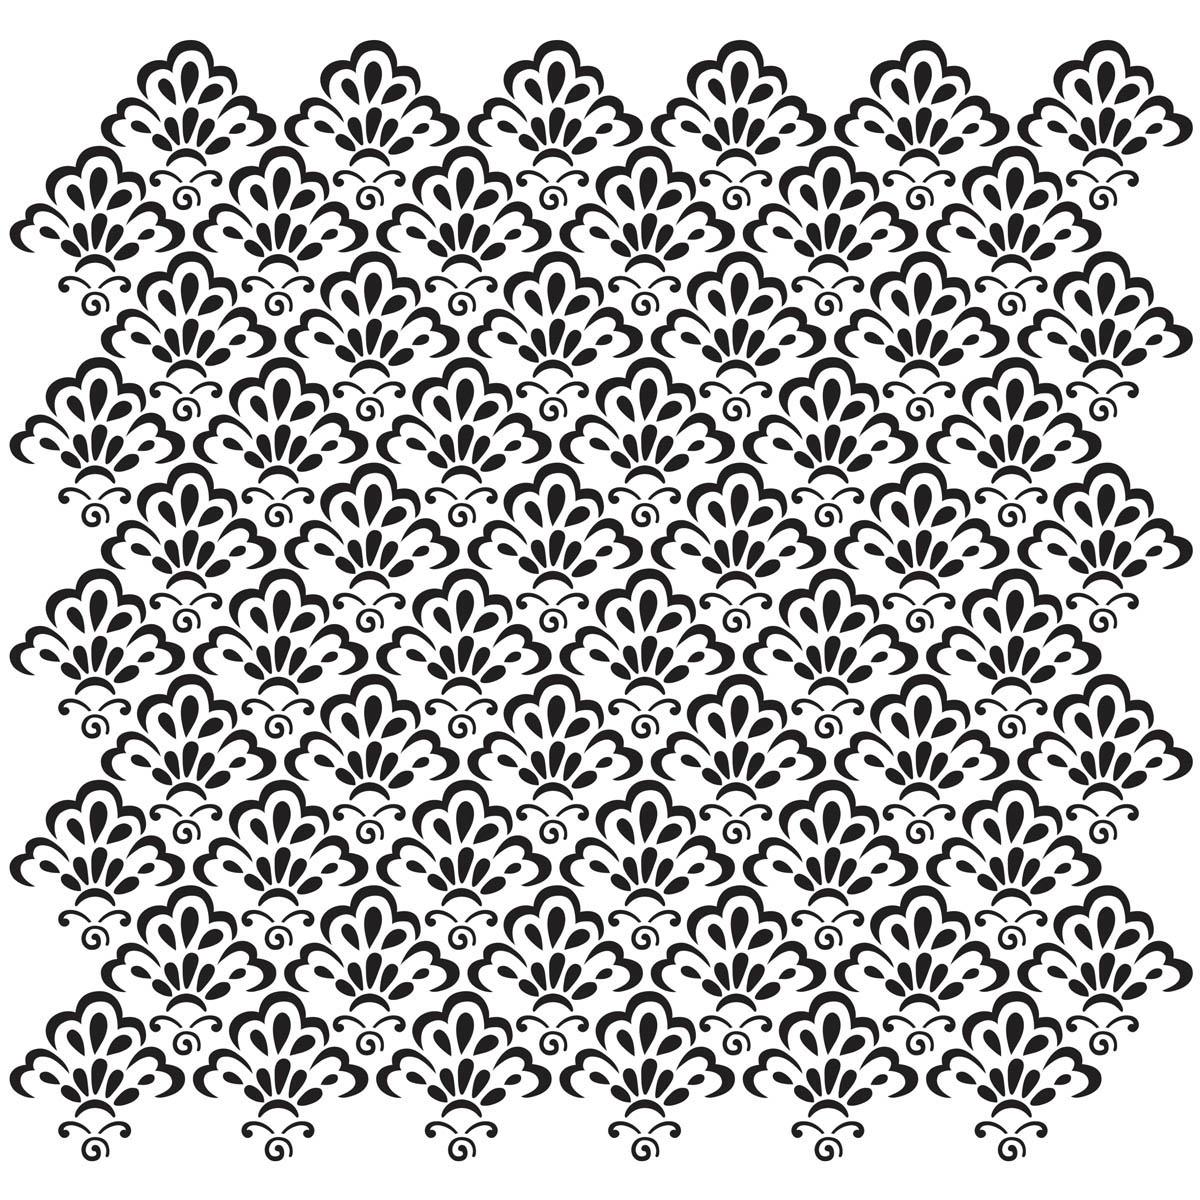 Waverly ® Inspirations Laser Stencils - Décor - Scallop, 12